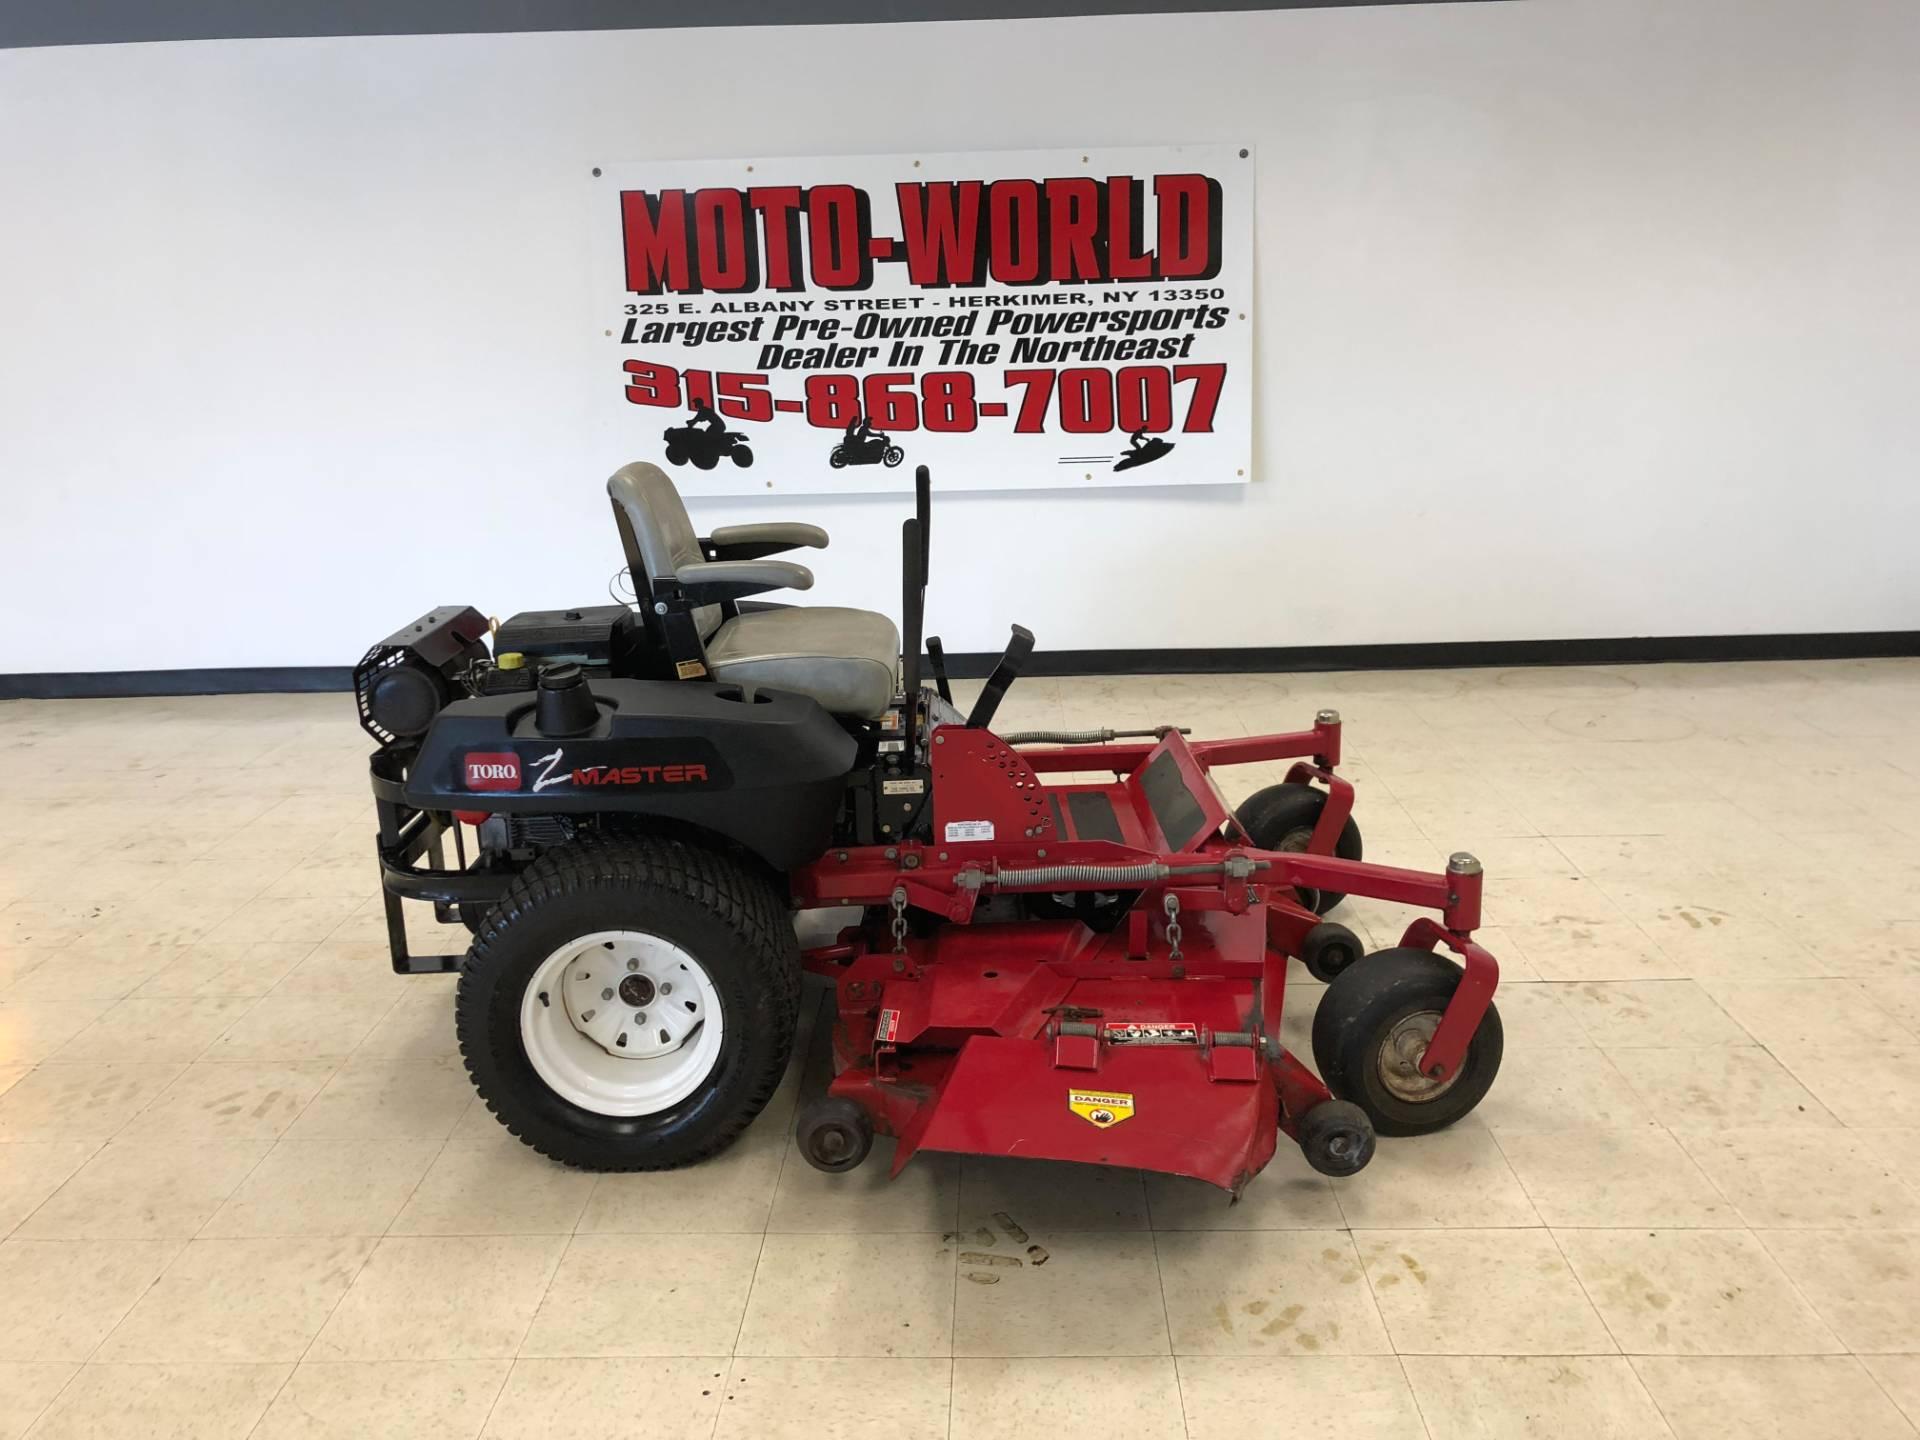 Used 2008 Toro Z Master® G3 25 hp Kohler (74903) Lawn Mowers ...